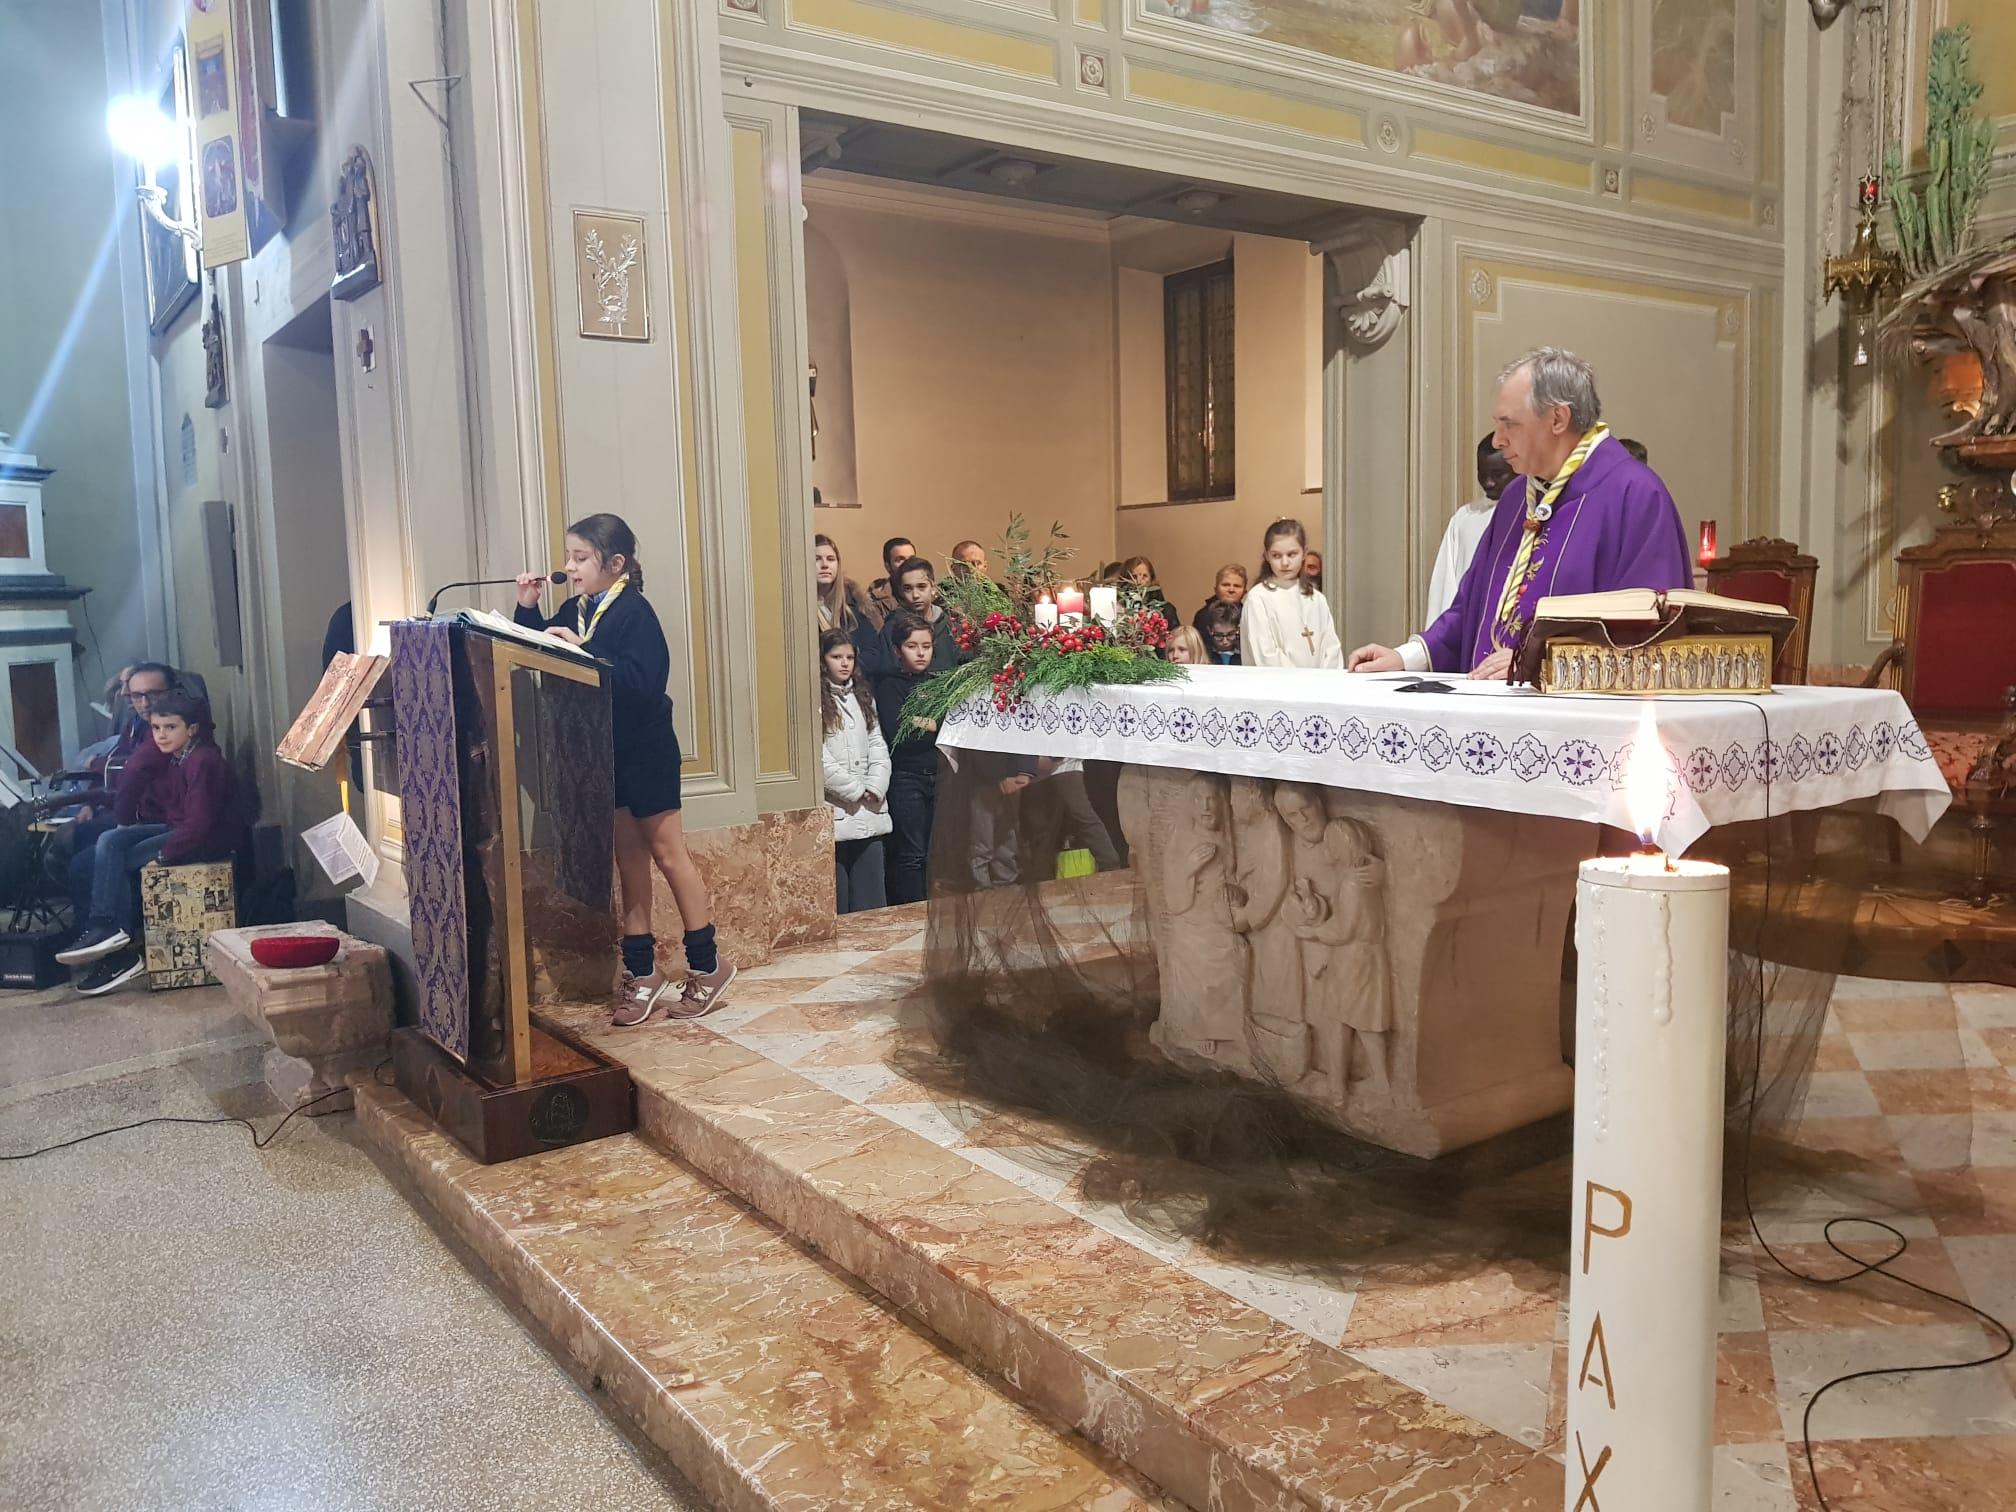 Luce di Betlemme 2019 santa messa (61)